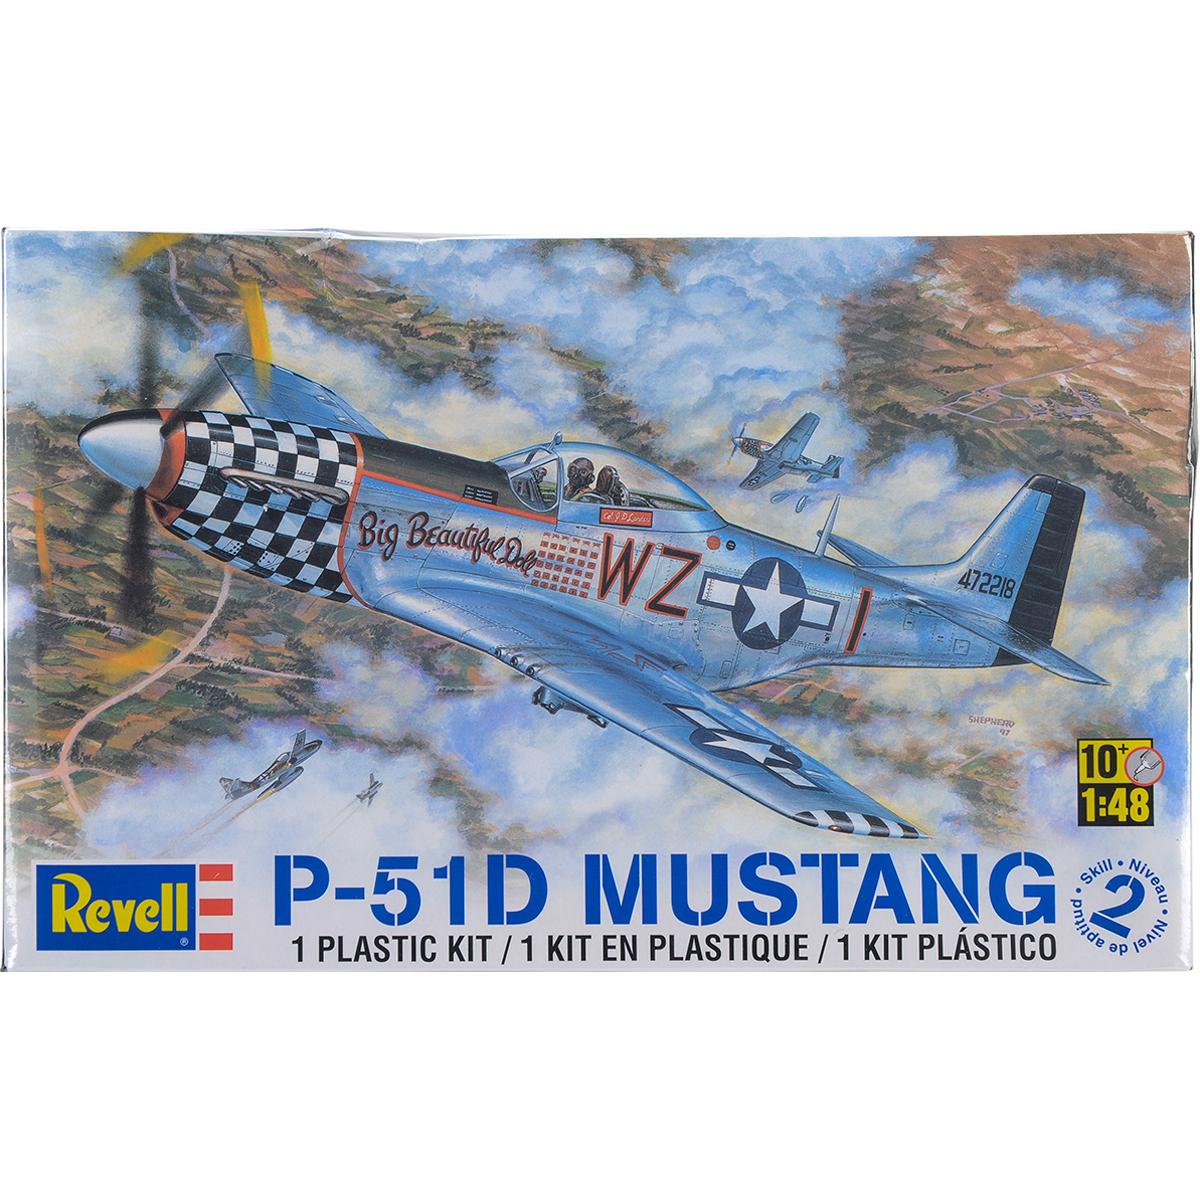 Plastic Model Kit-P-51D Mustang 1:48